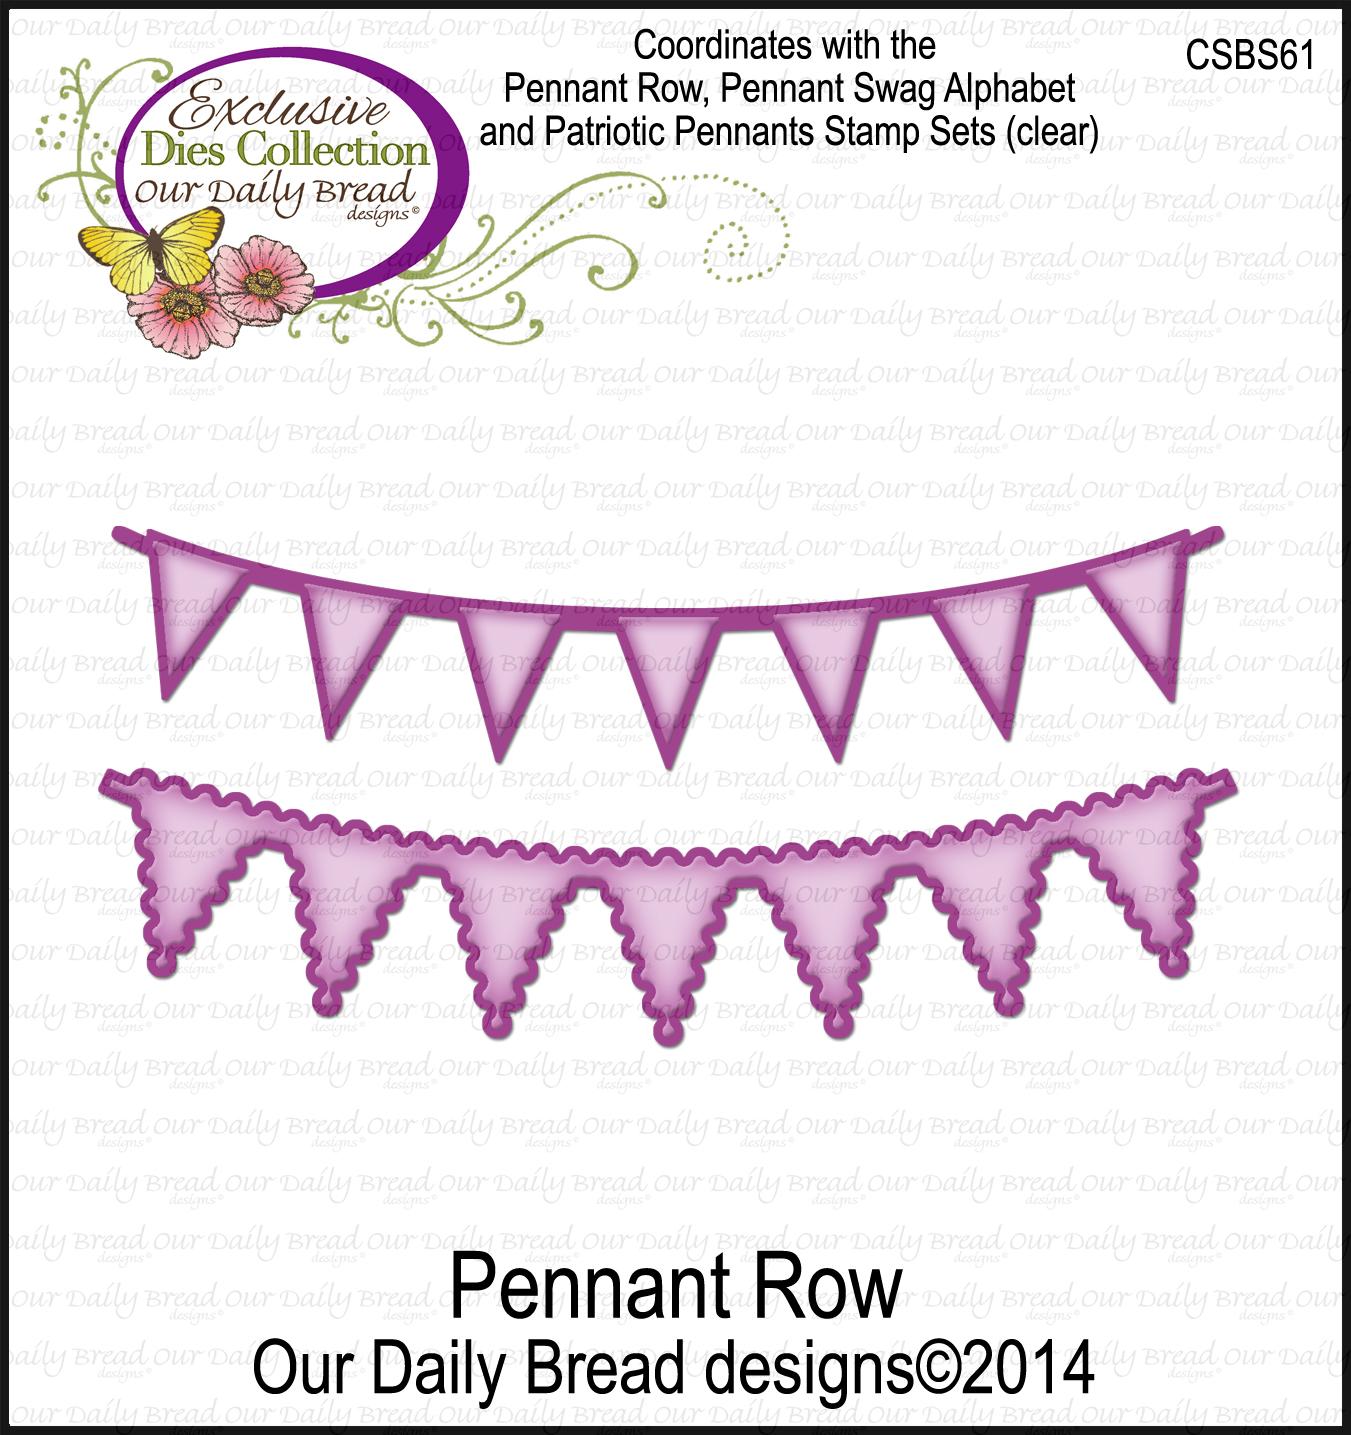 https://www.ourdailybreaddesigns.com/index.php/csbd61-pennant-row-die.html